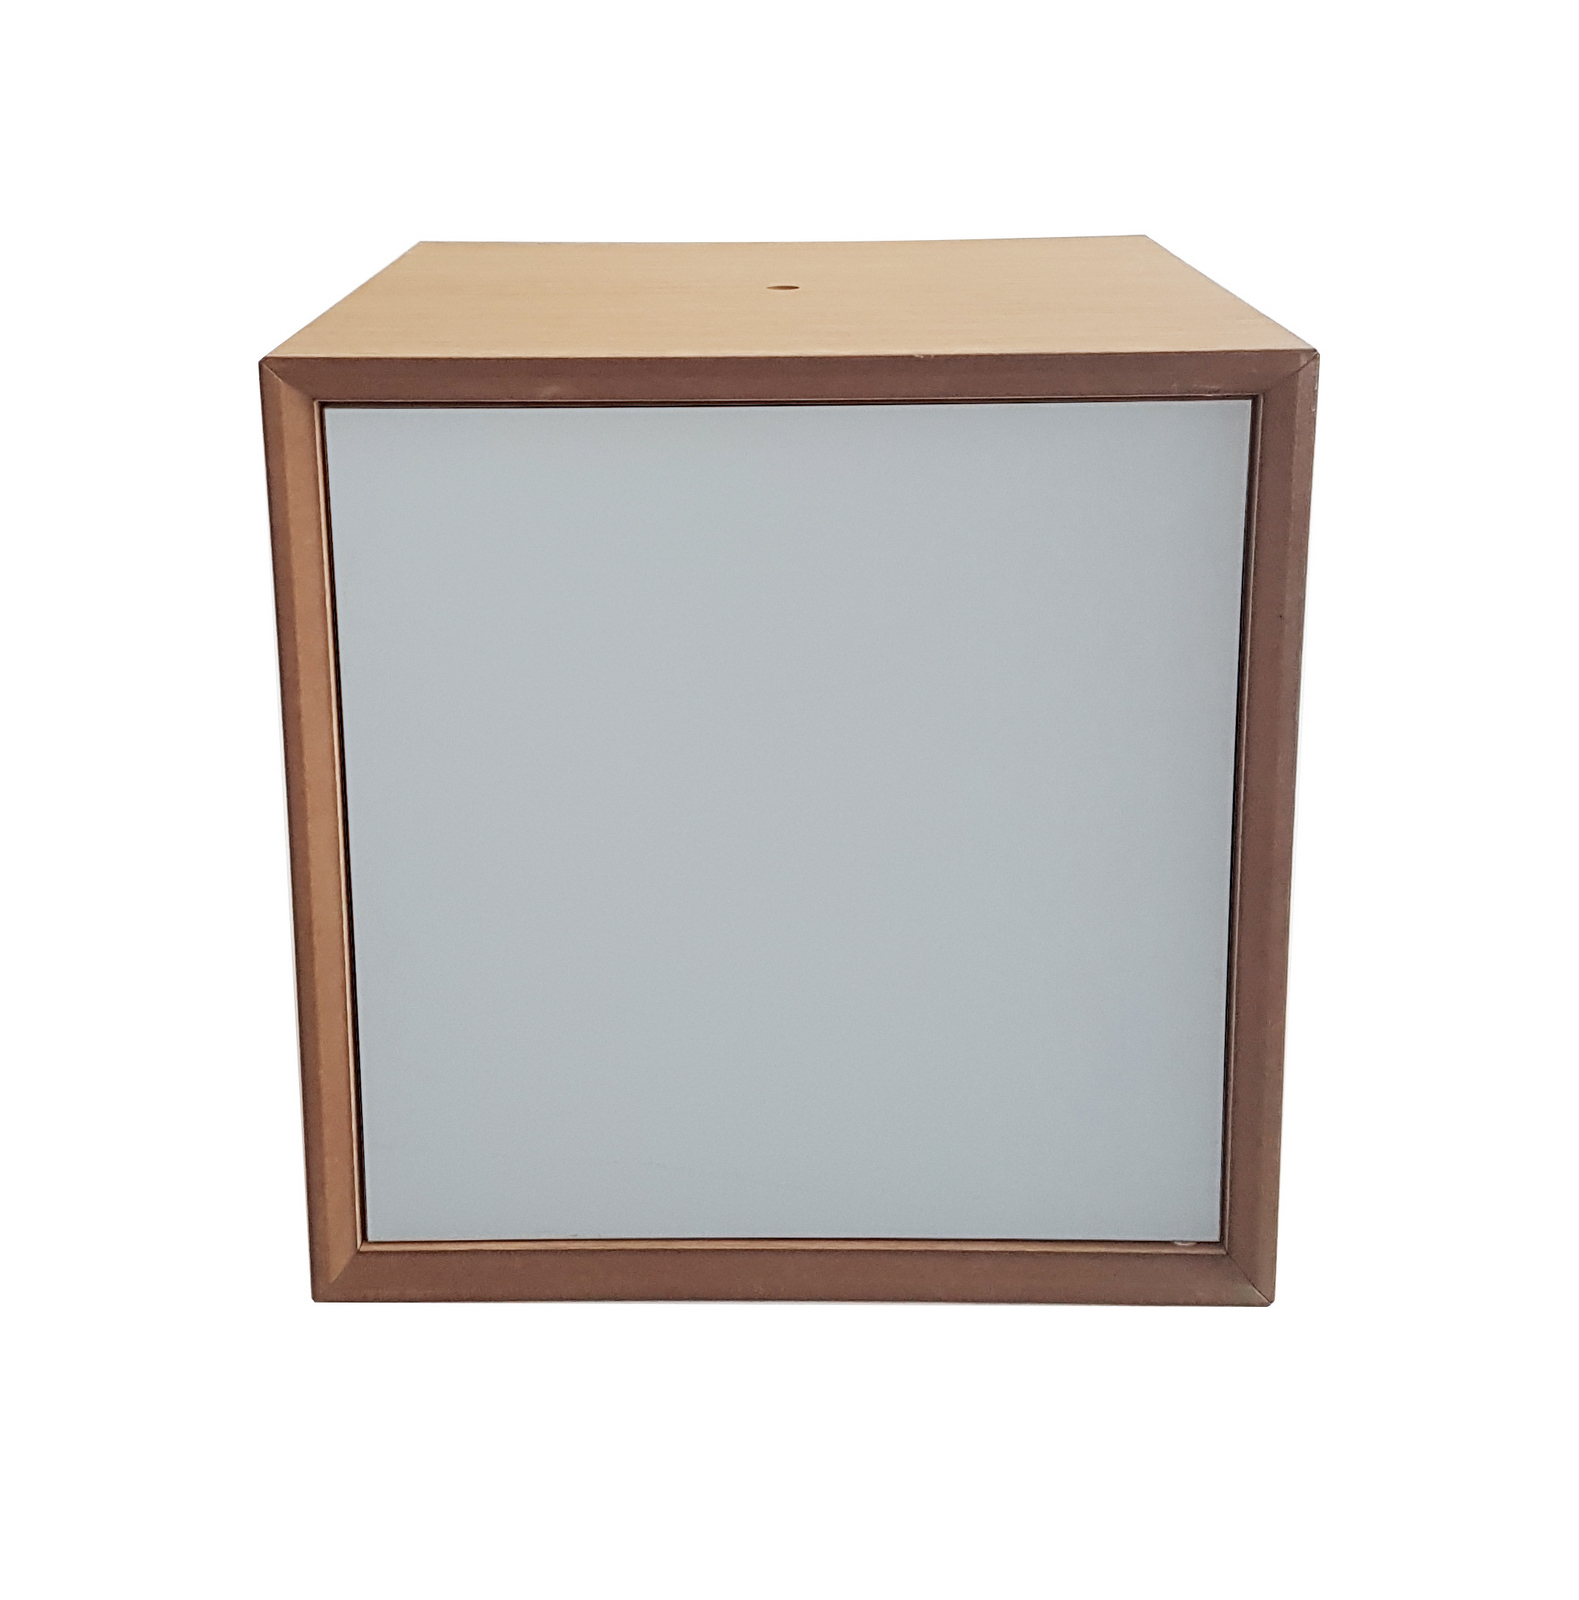 Dulap modular Pixel Dark Grey l40xA40xH40 cm